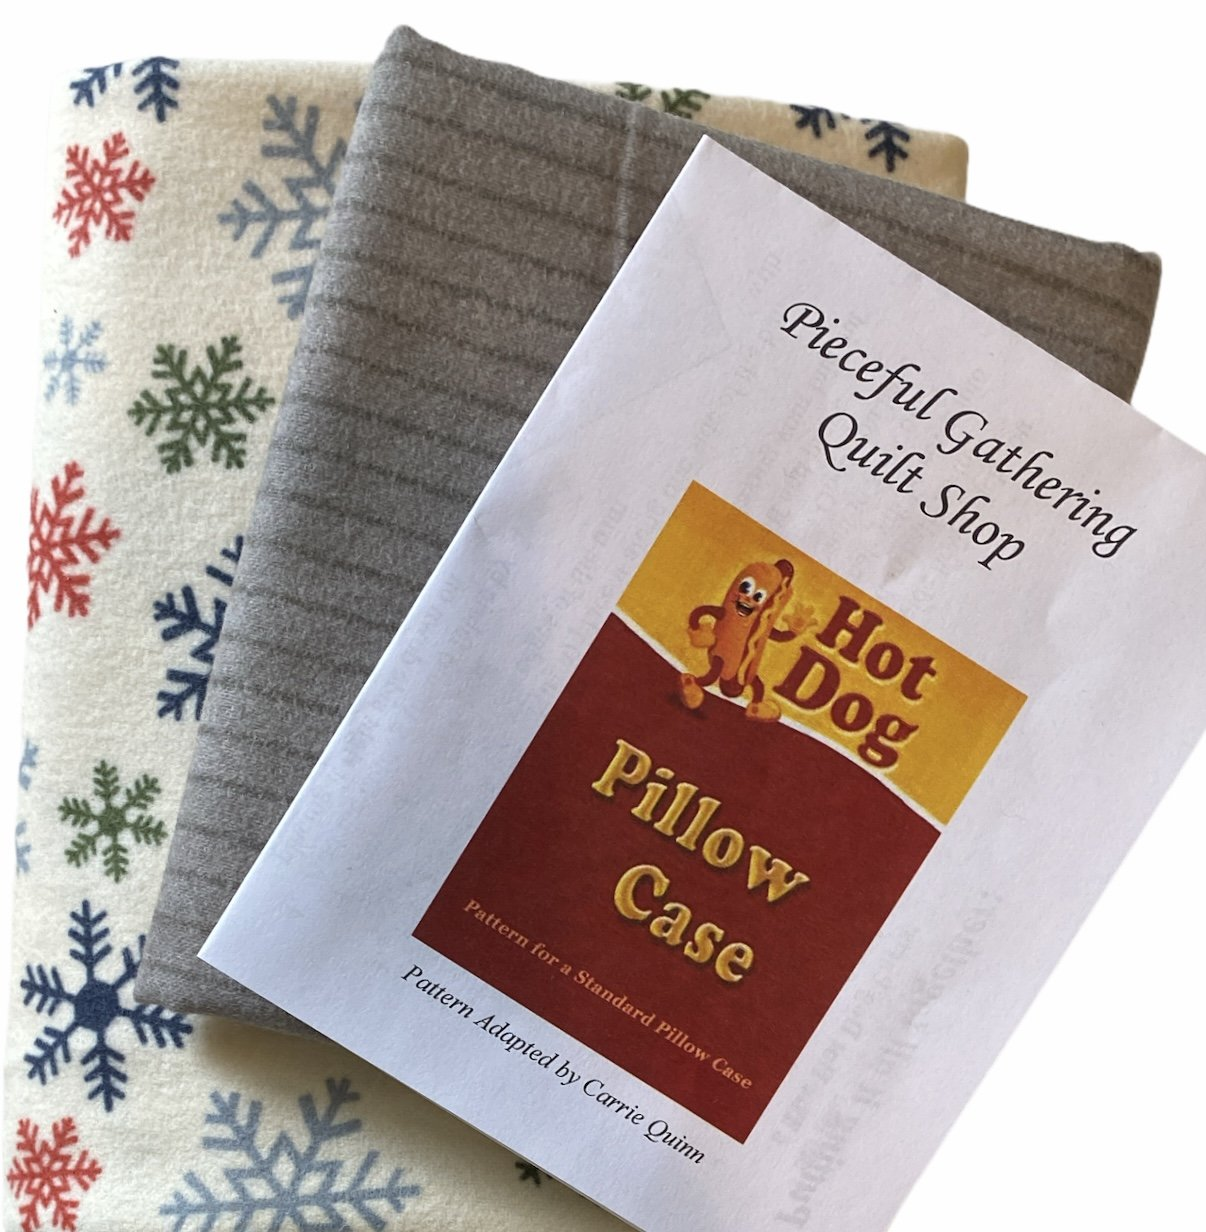 Flannel Pillow Case Kit - Snowflakes